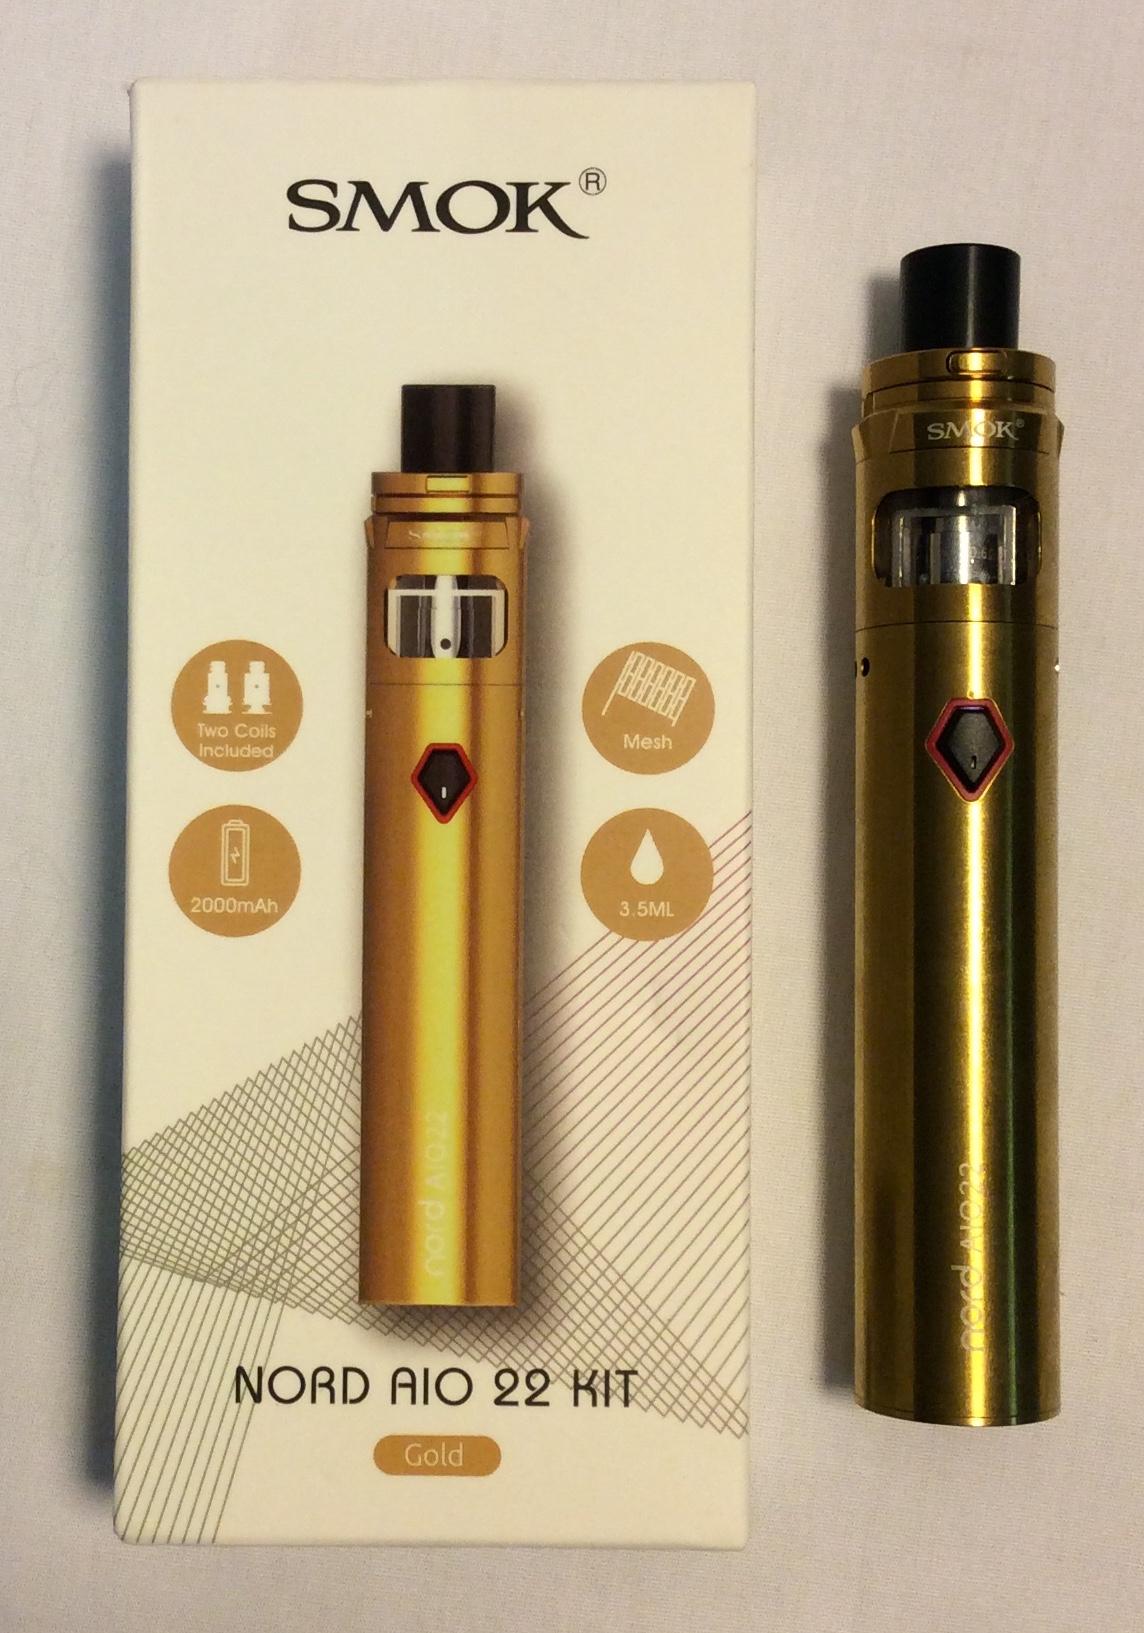 Smok e-cigarette; Gold cylindrical